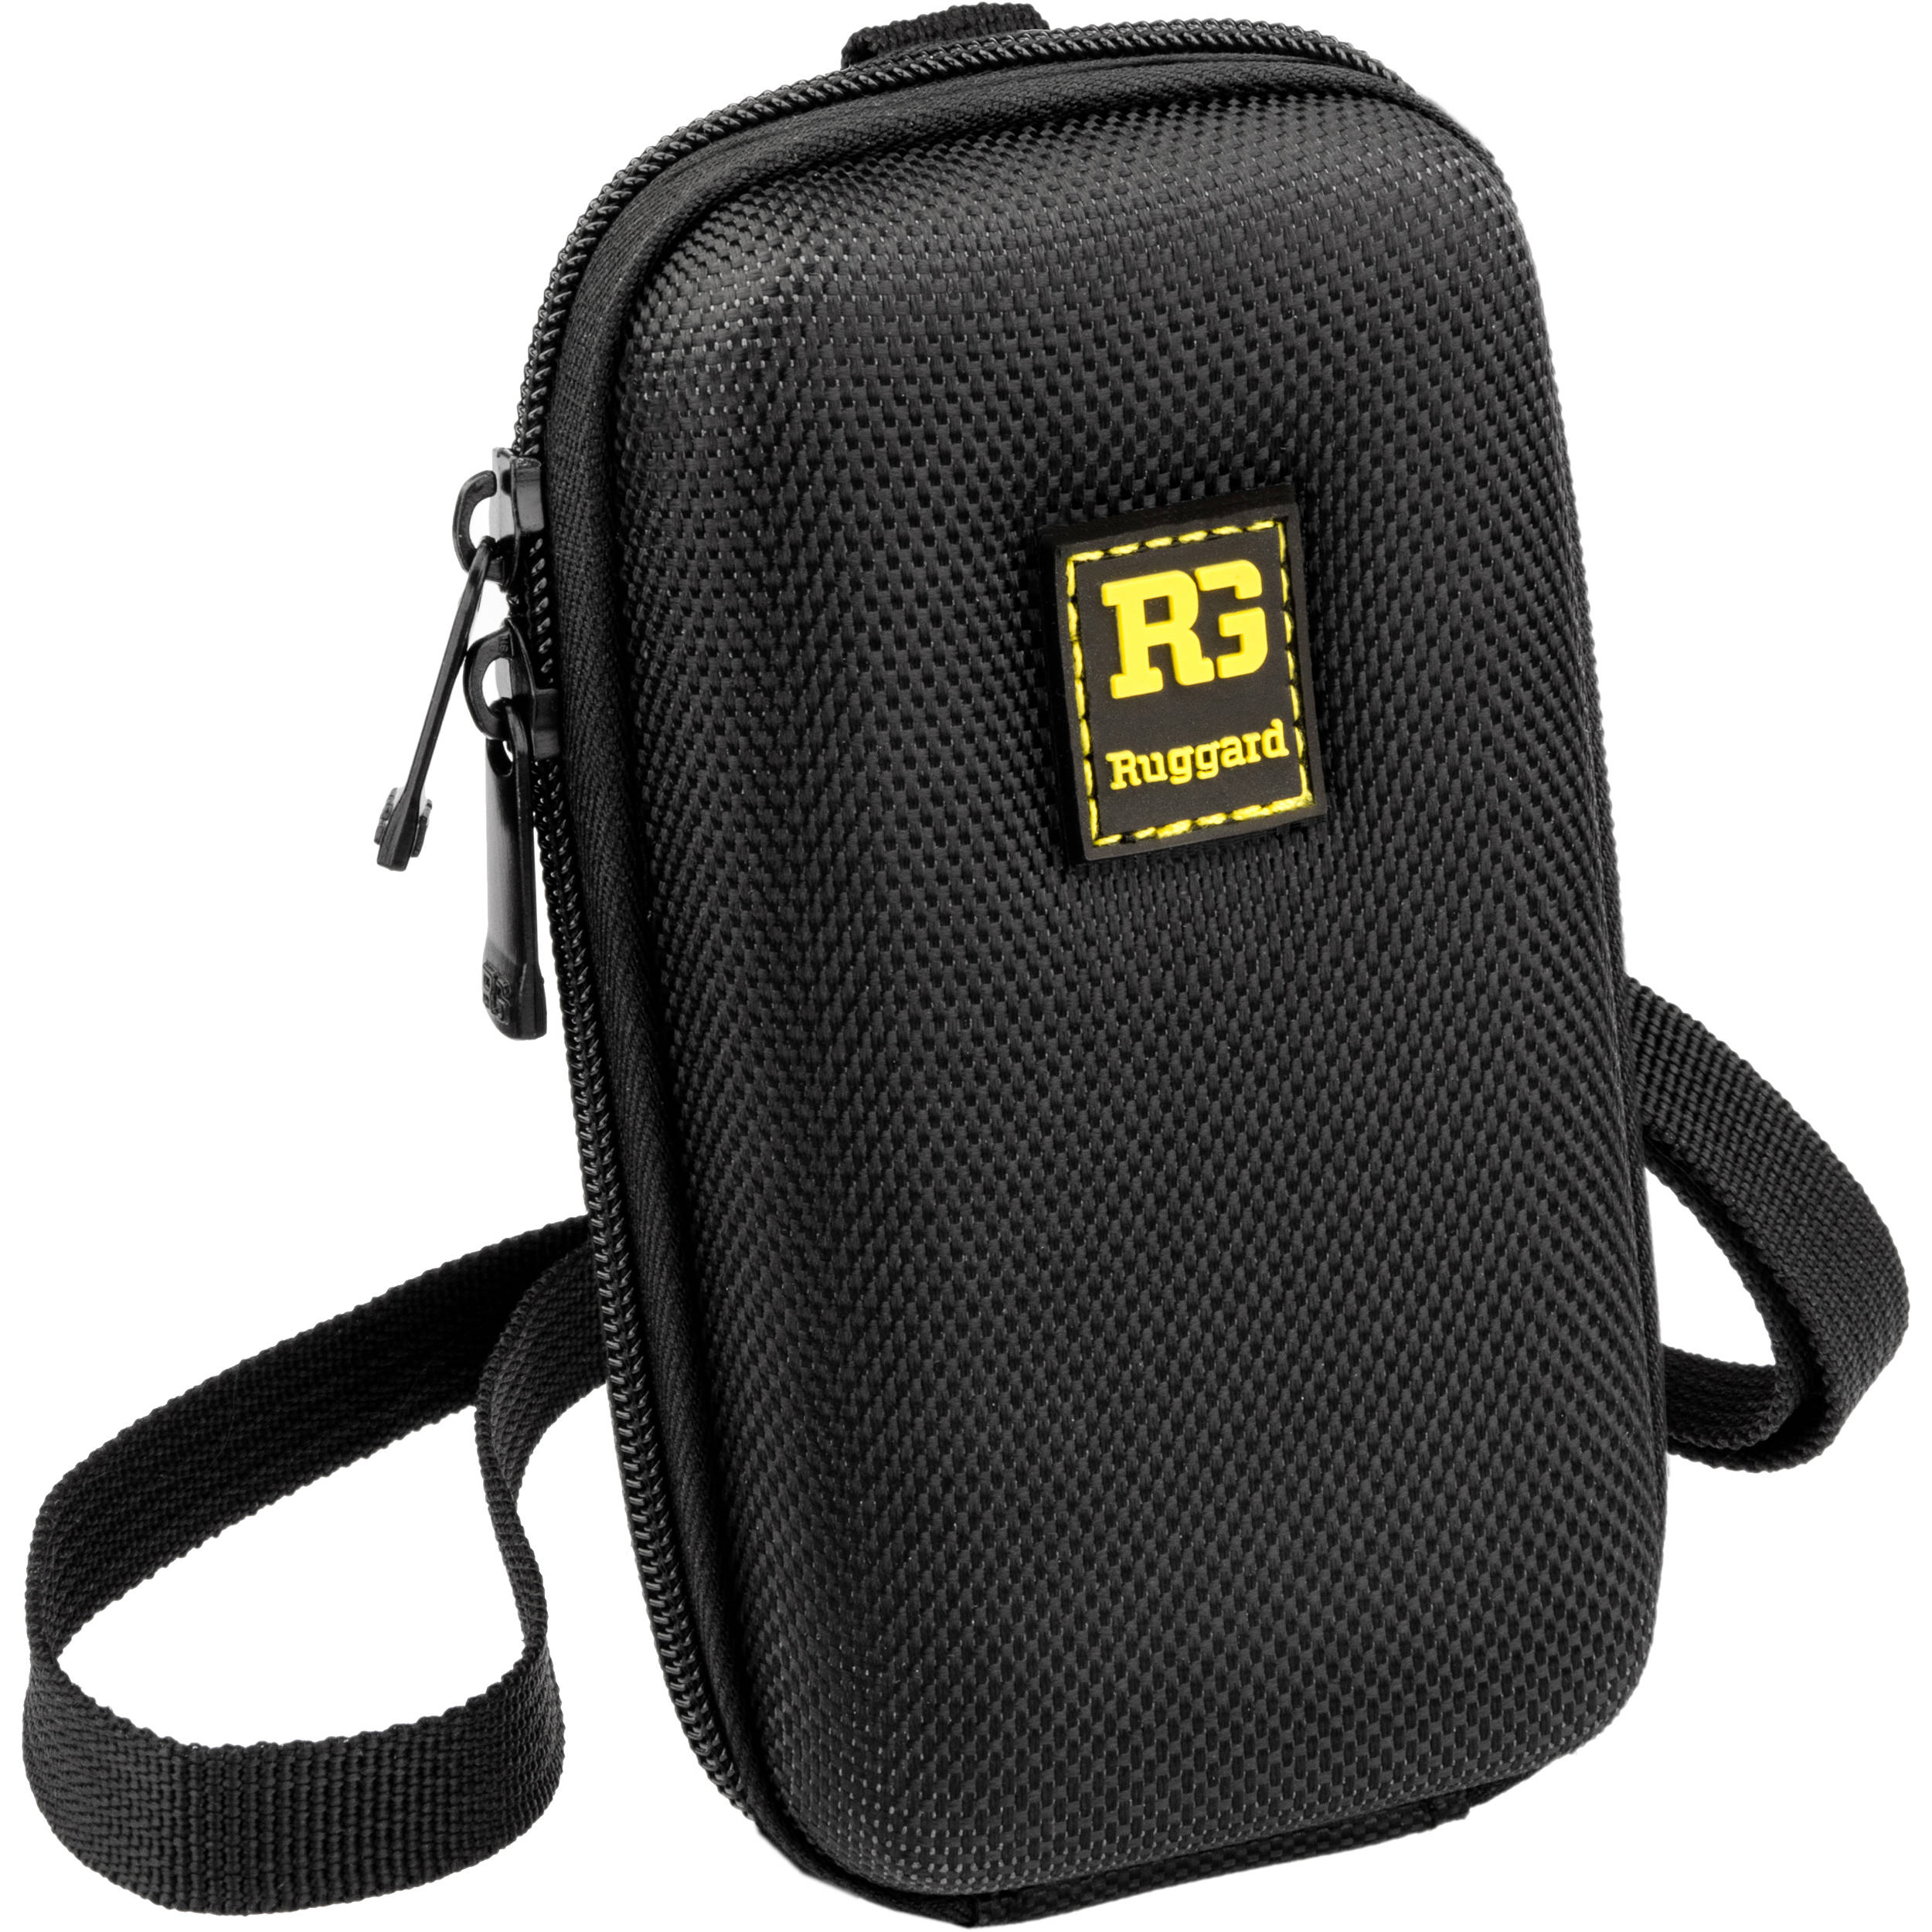 Ruggard HFV-260 Protective Camera Case HFV-260 B&H Photo Video